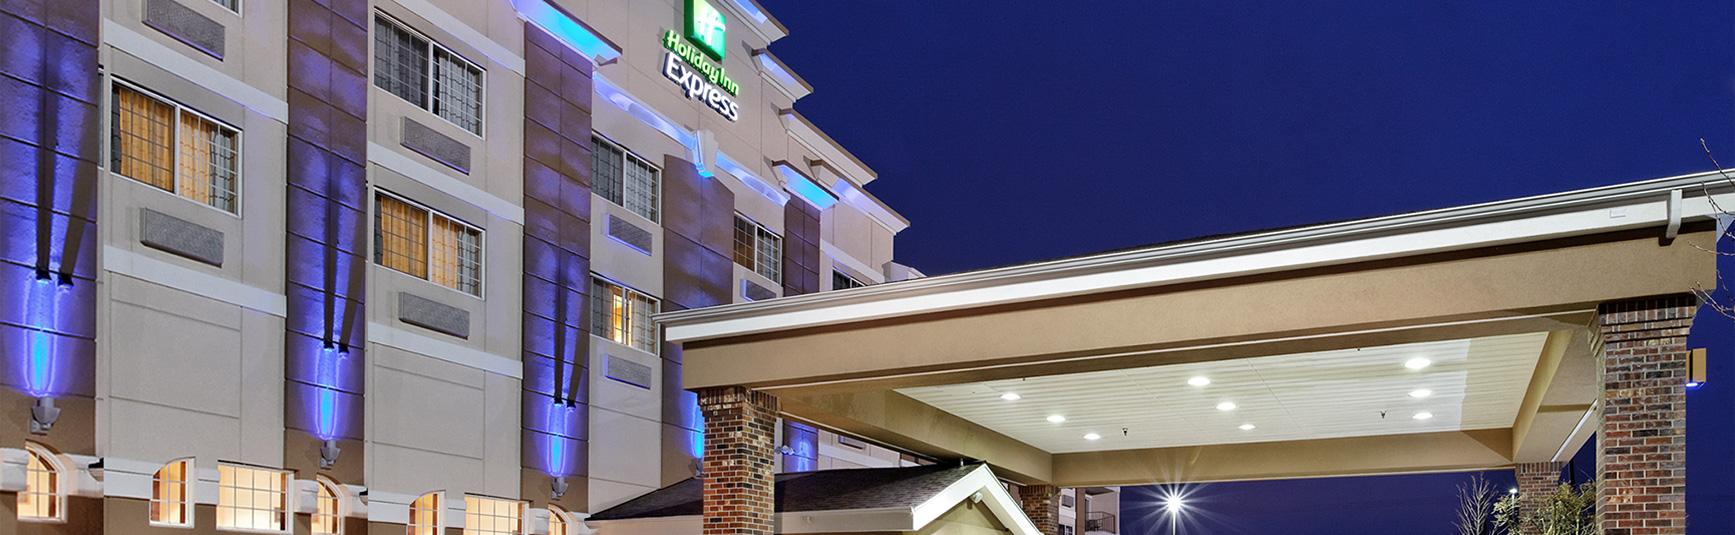 Holiday Inn Express – Spokane Valley